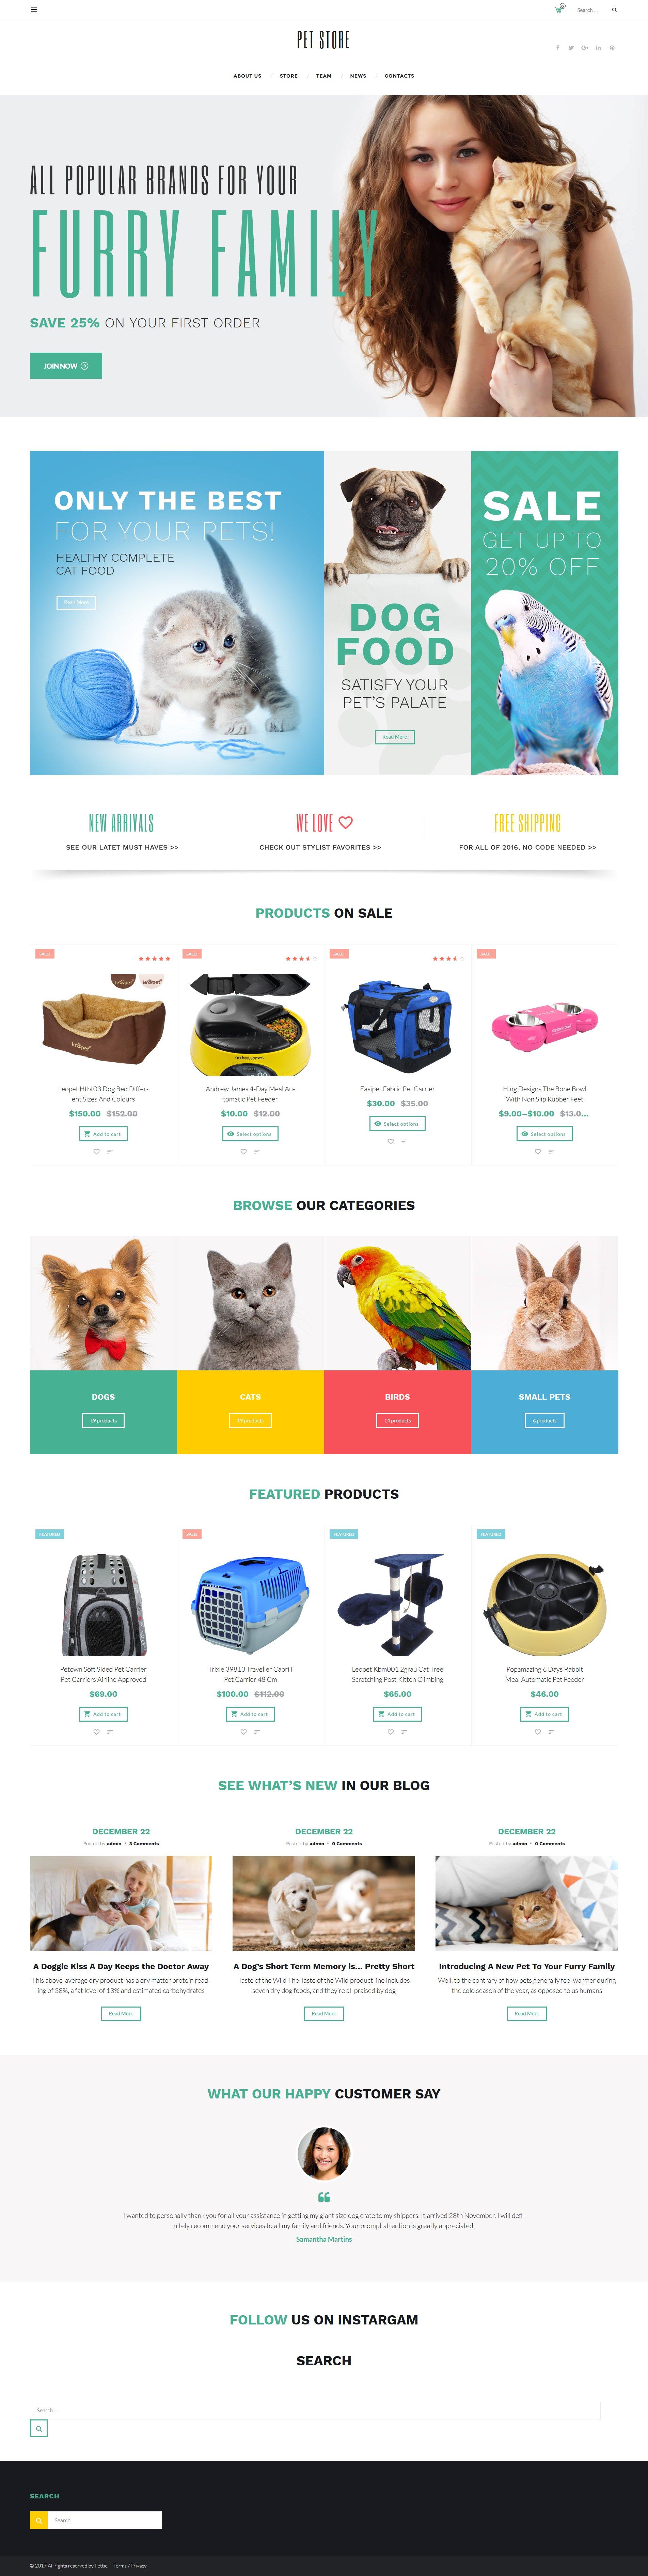 """PetStore - Pets Supplies Shop Responsive WooCommerce Theme"" - адаптивний WooCommerce шаблон №58660 - скріншот"